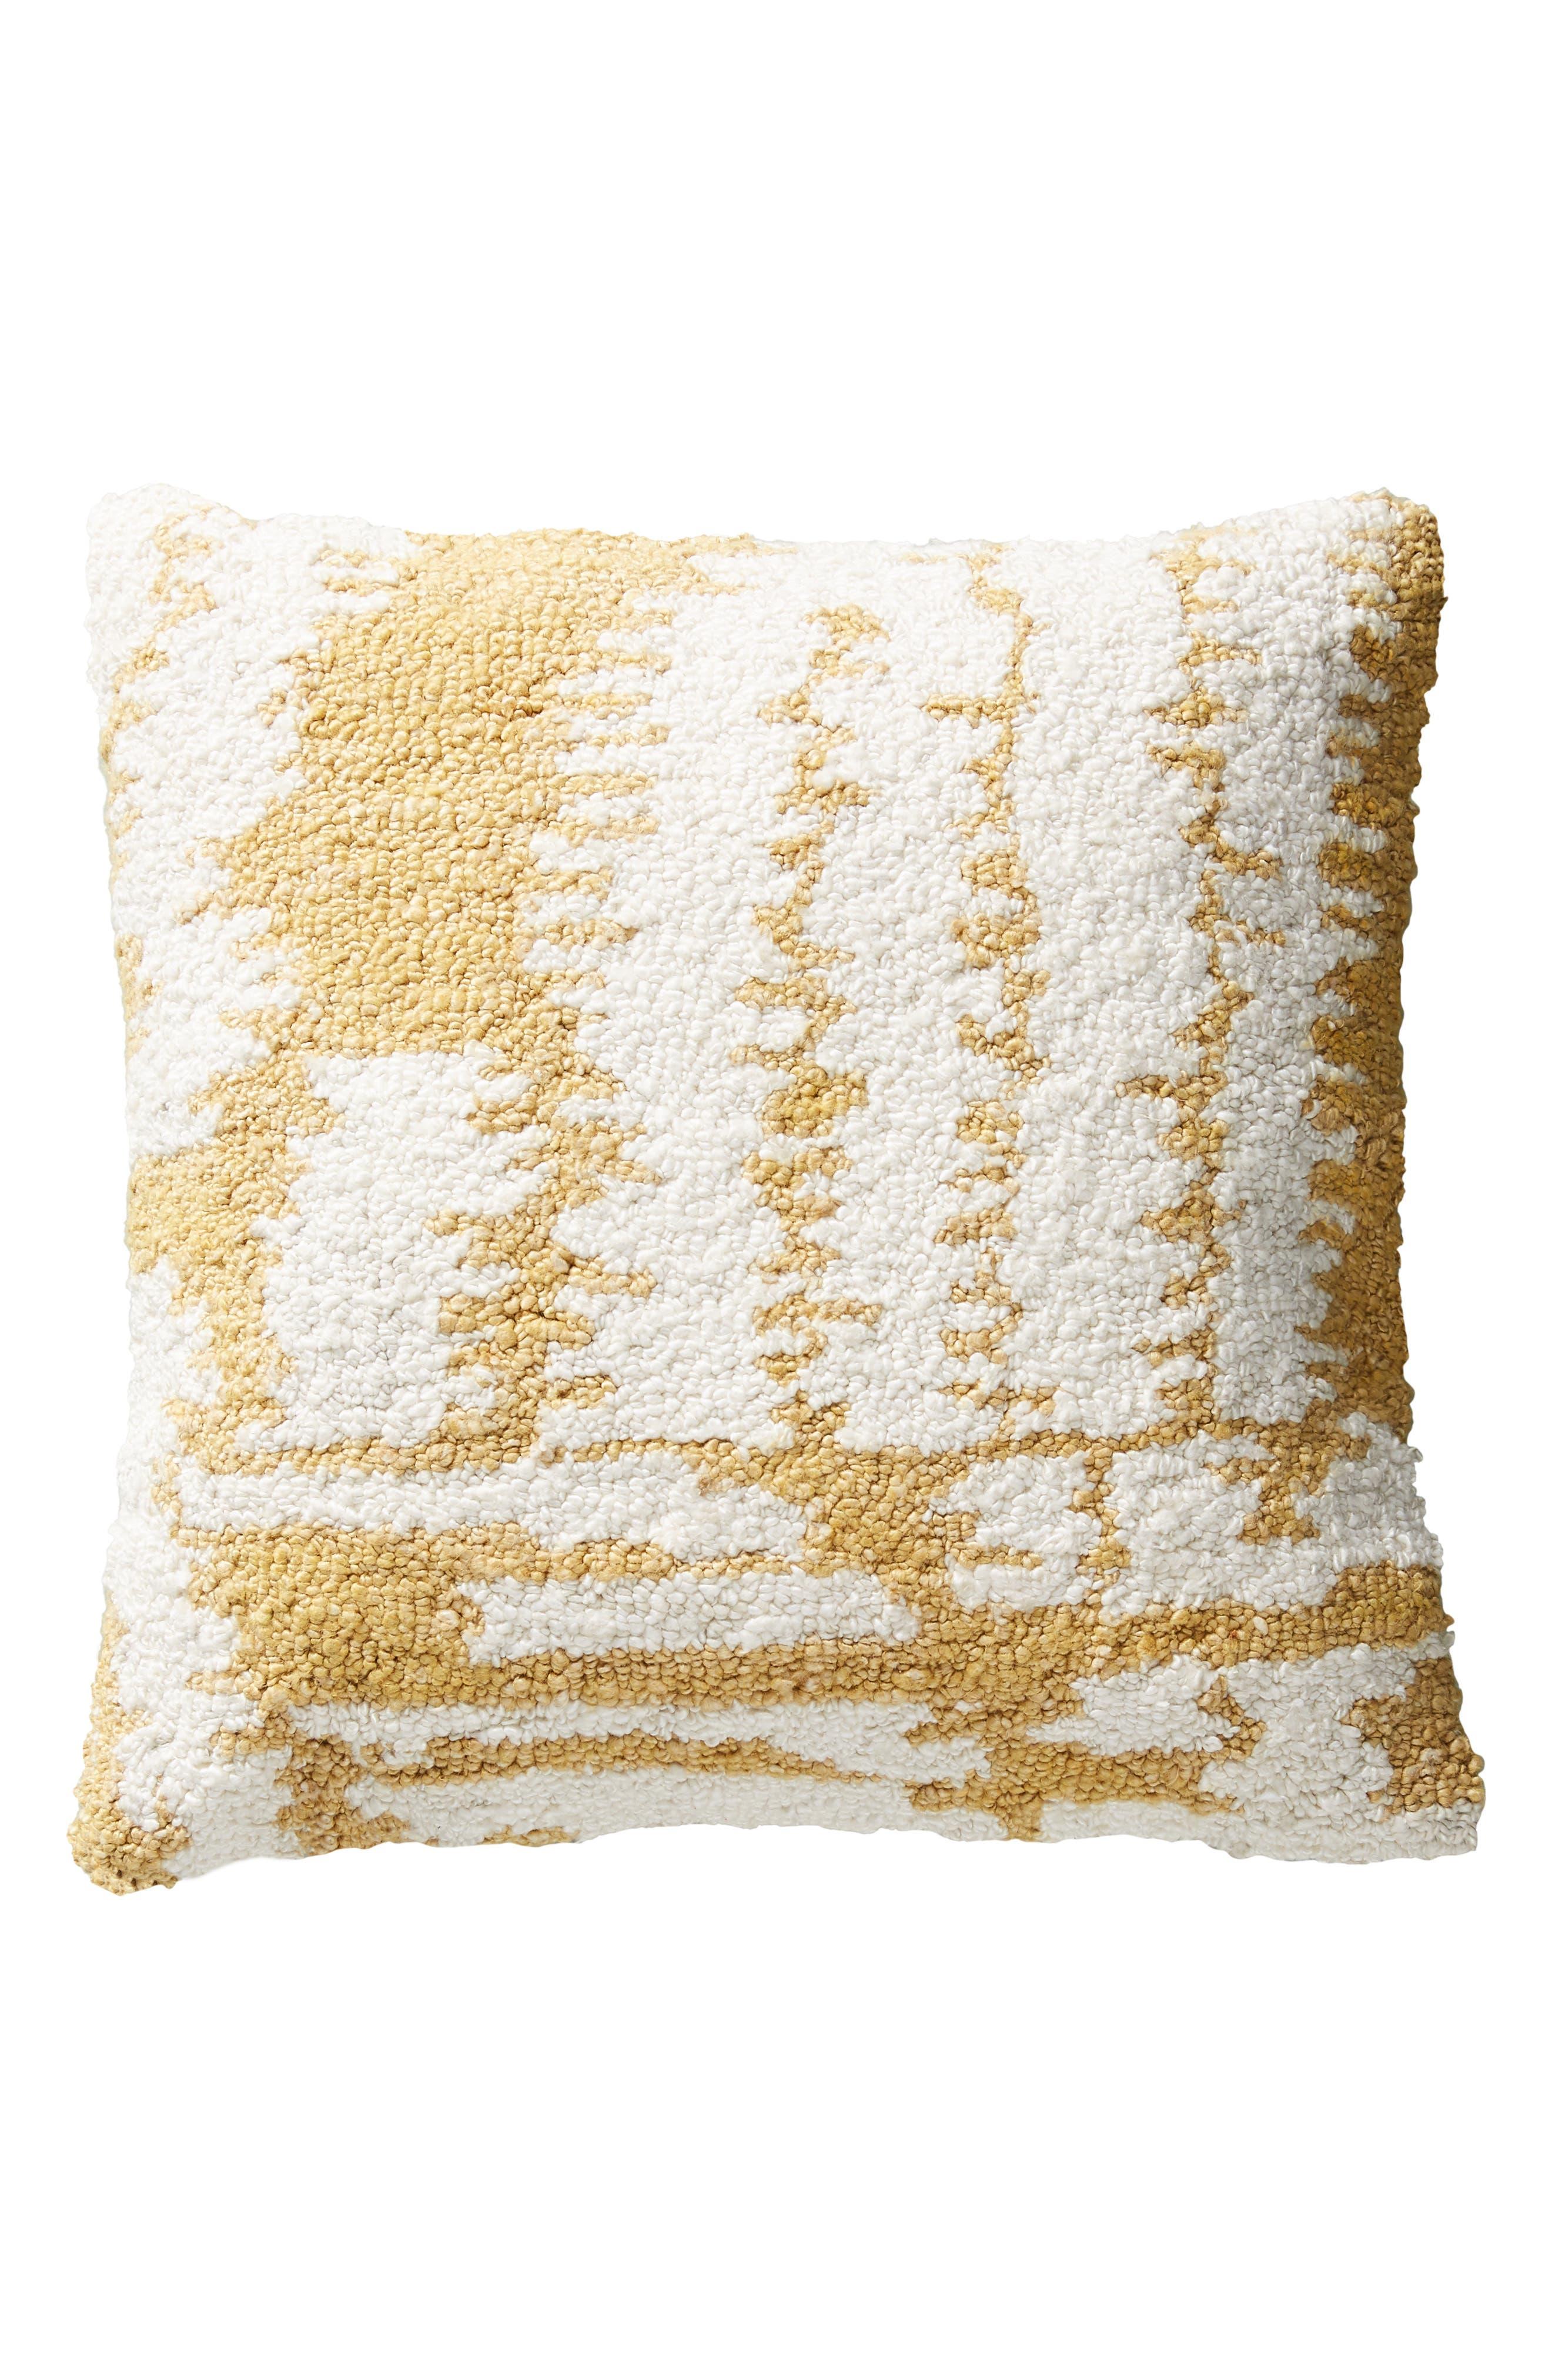 ANTHROPOLOGIE, Jordana Accent Pillow, Alternate thumbnail 4, color, 700